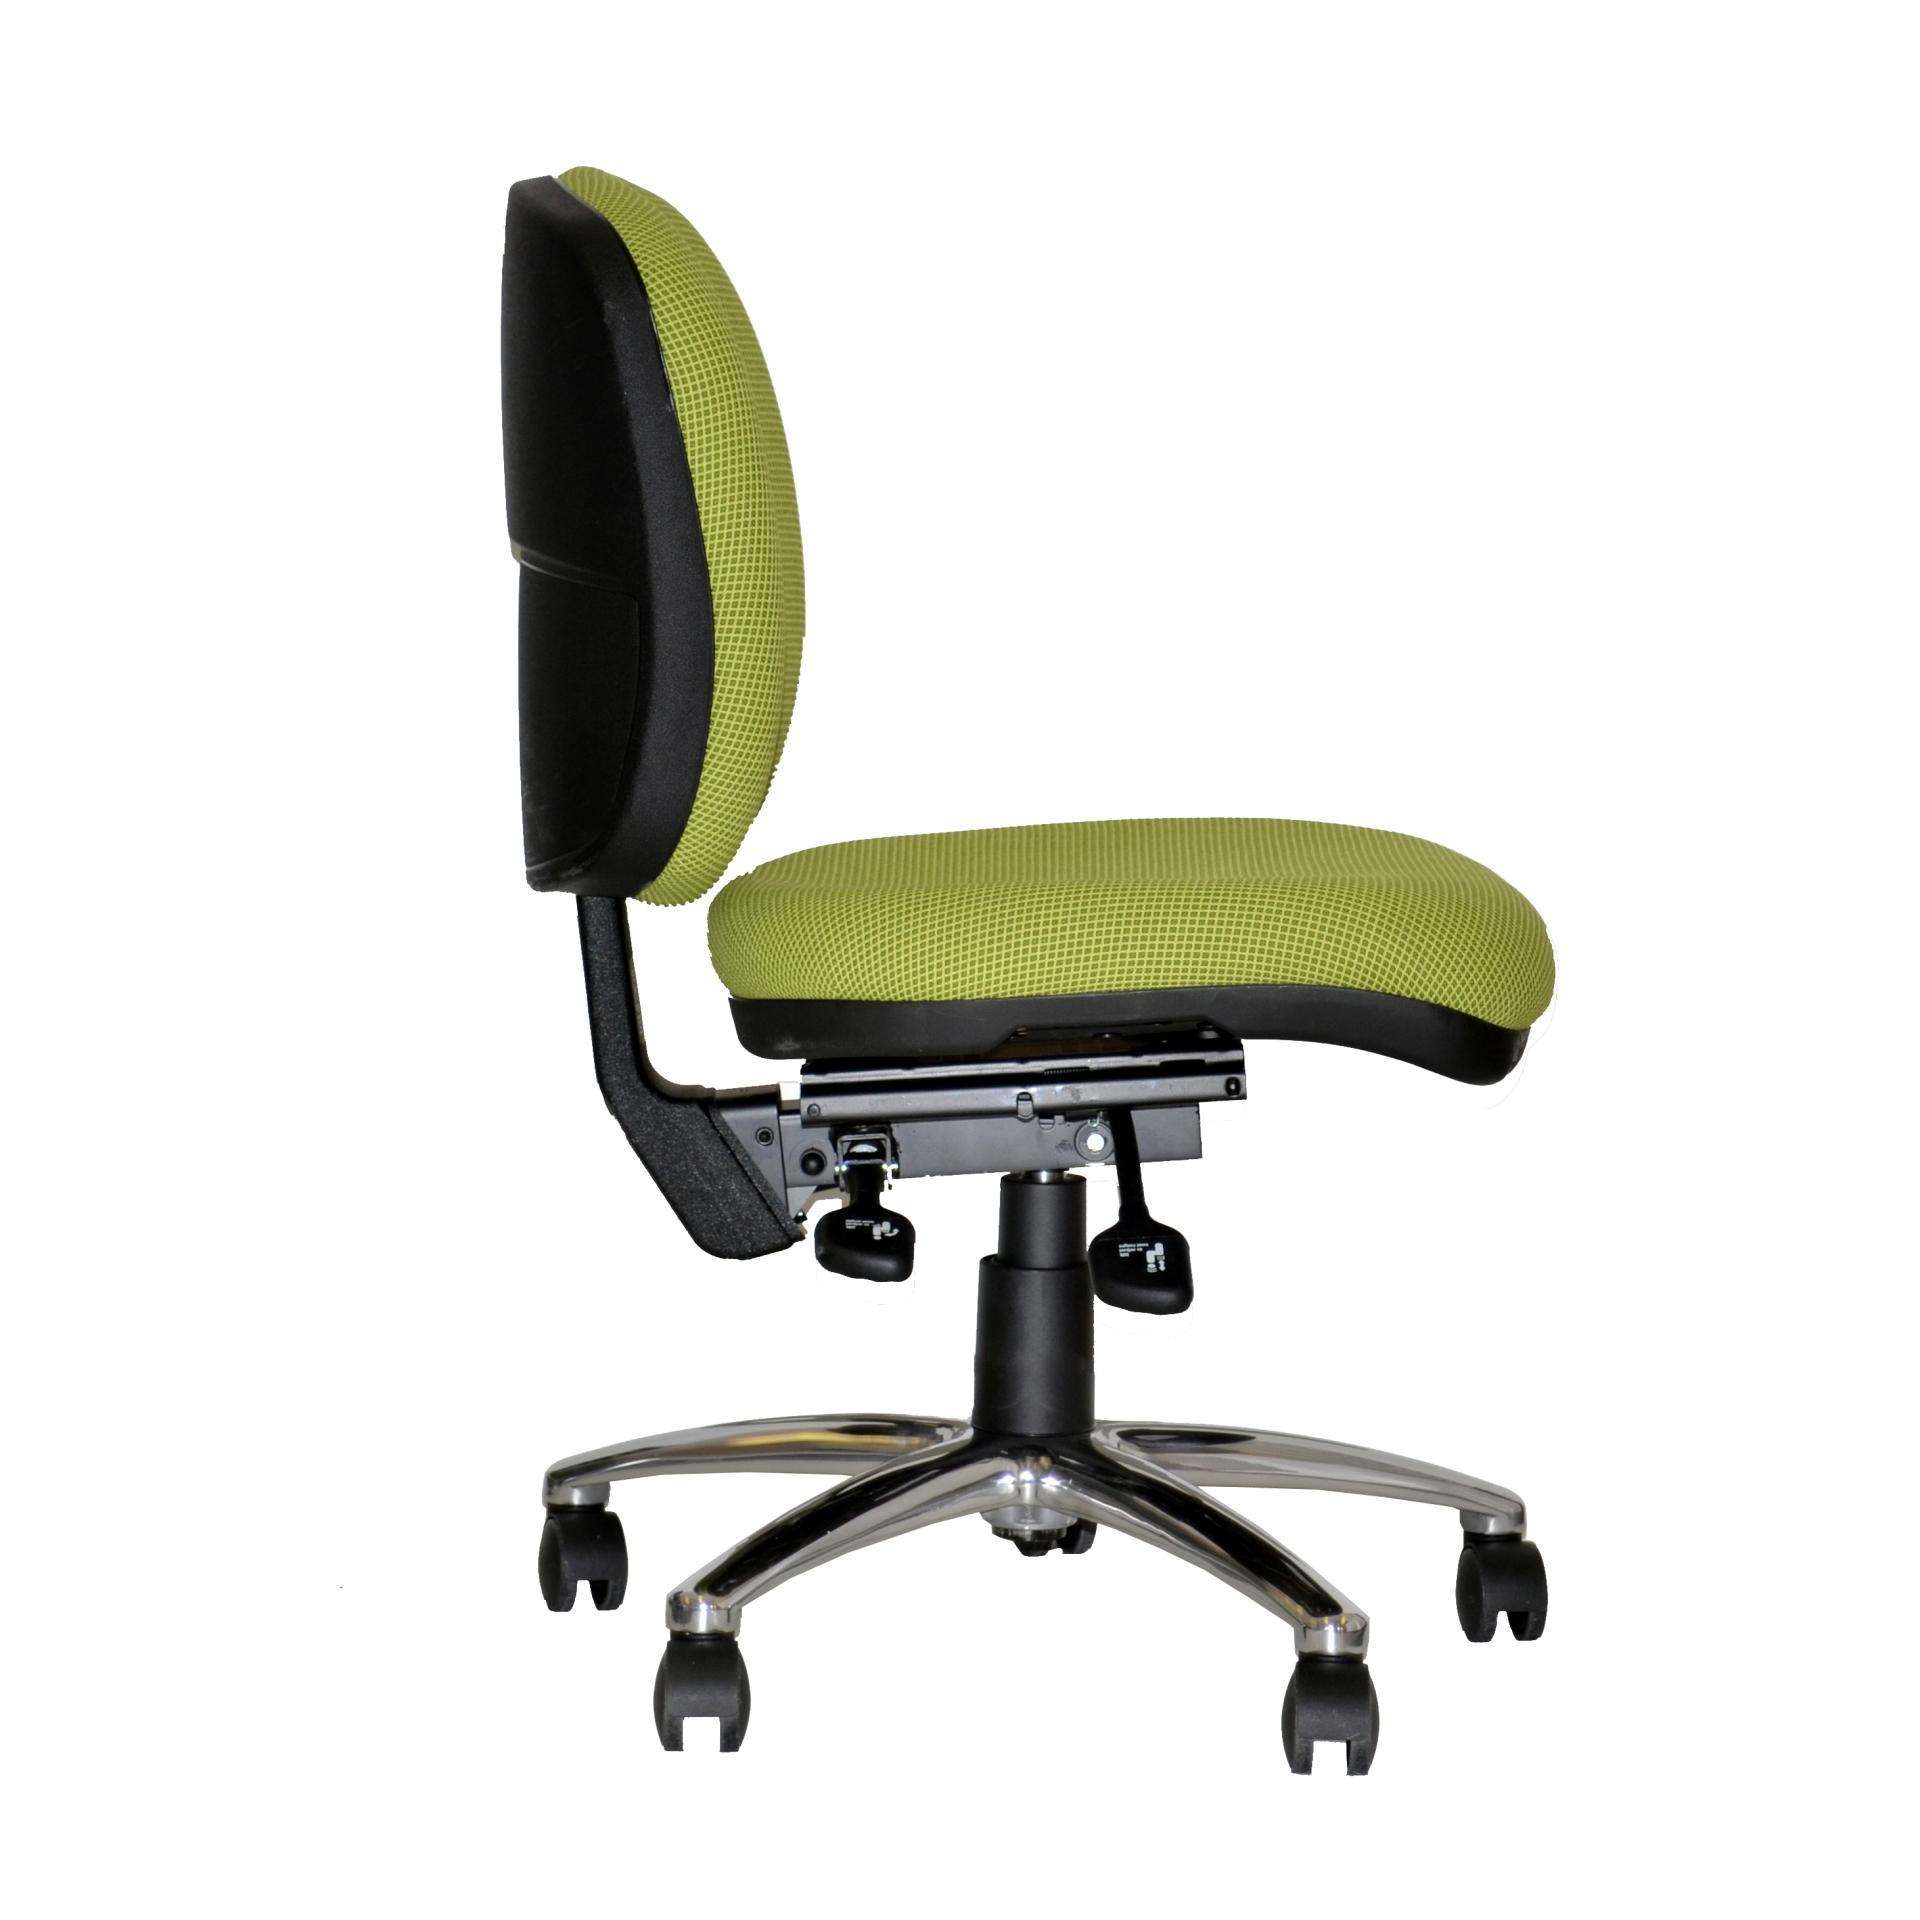 Direct Ergonomics | Sydney Office Furniture | Ergonomic Furniture | Ergonomic Seating | Excutive and Task Seating | Meeting Room Chair | Ergonomic Chair | Ezone 510